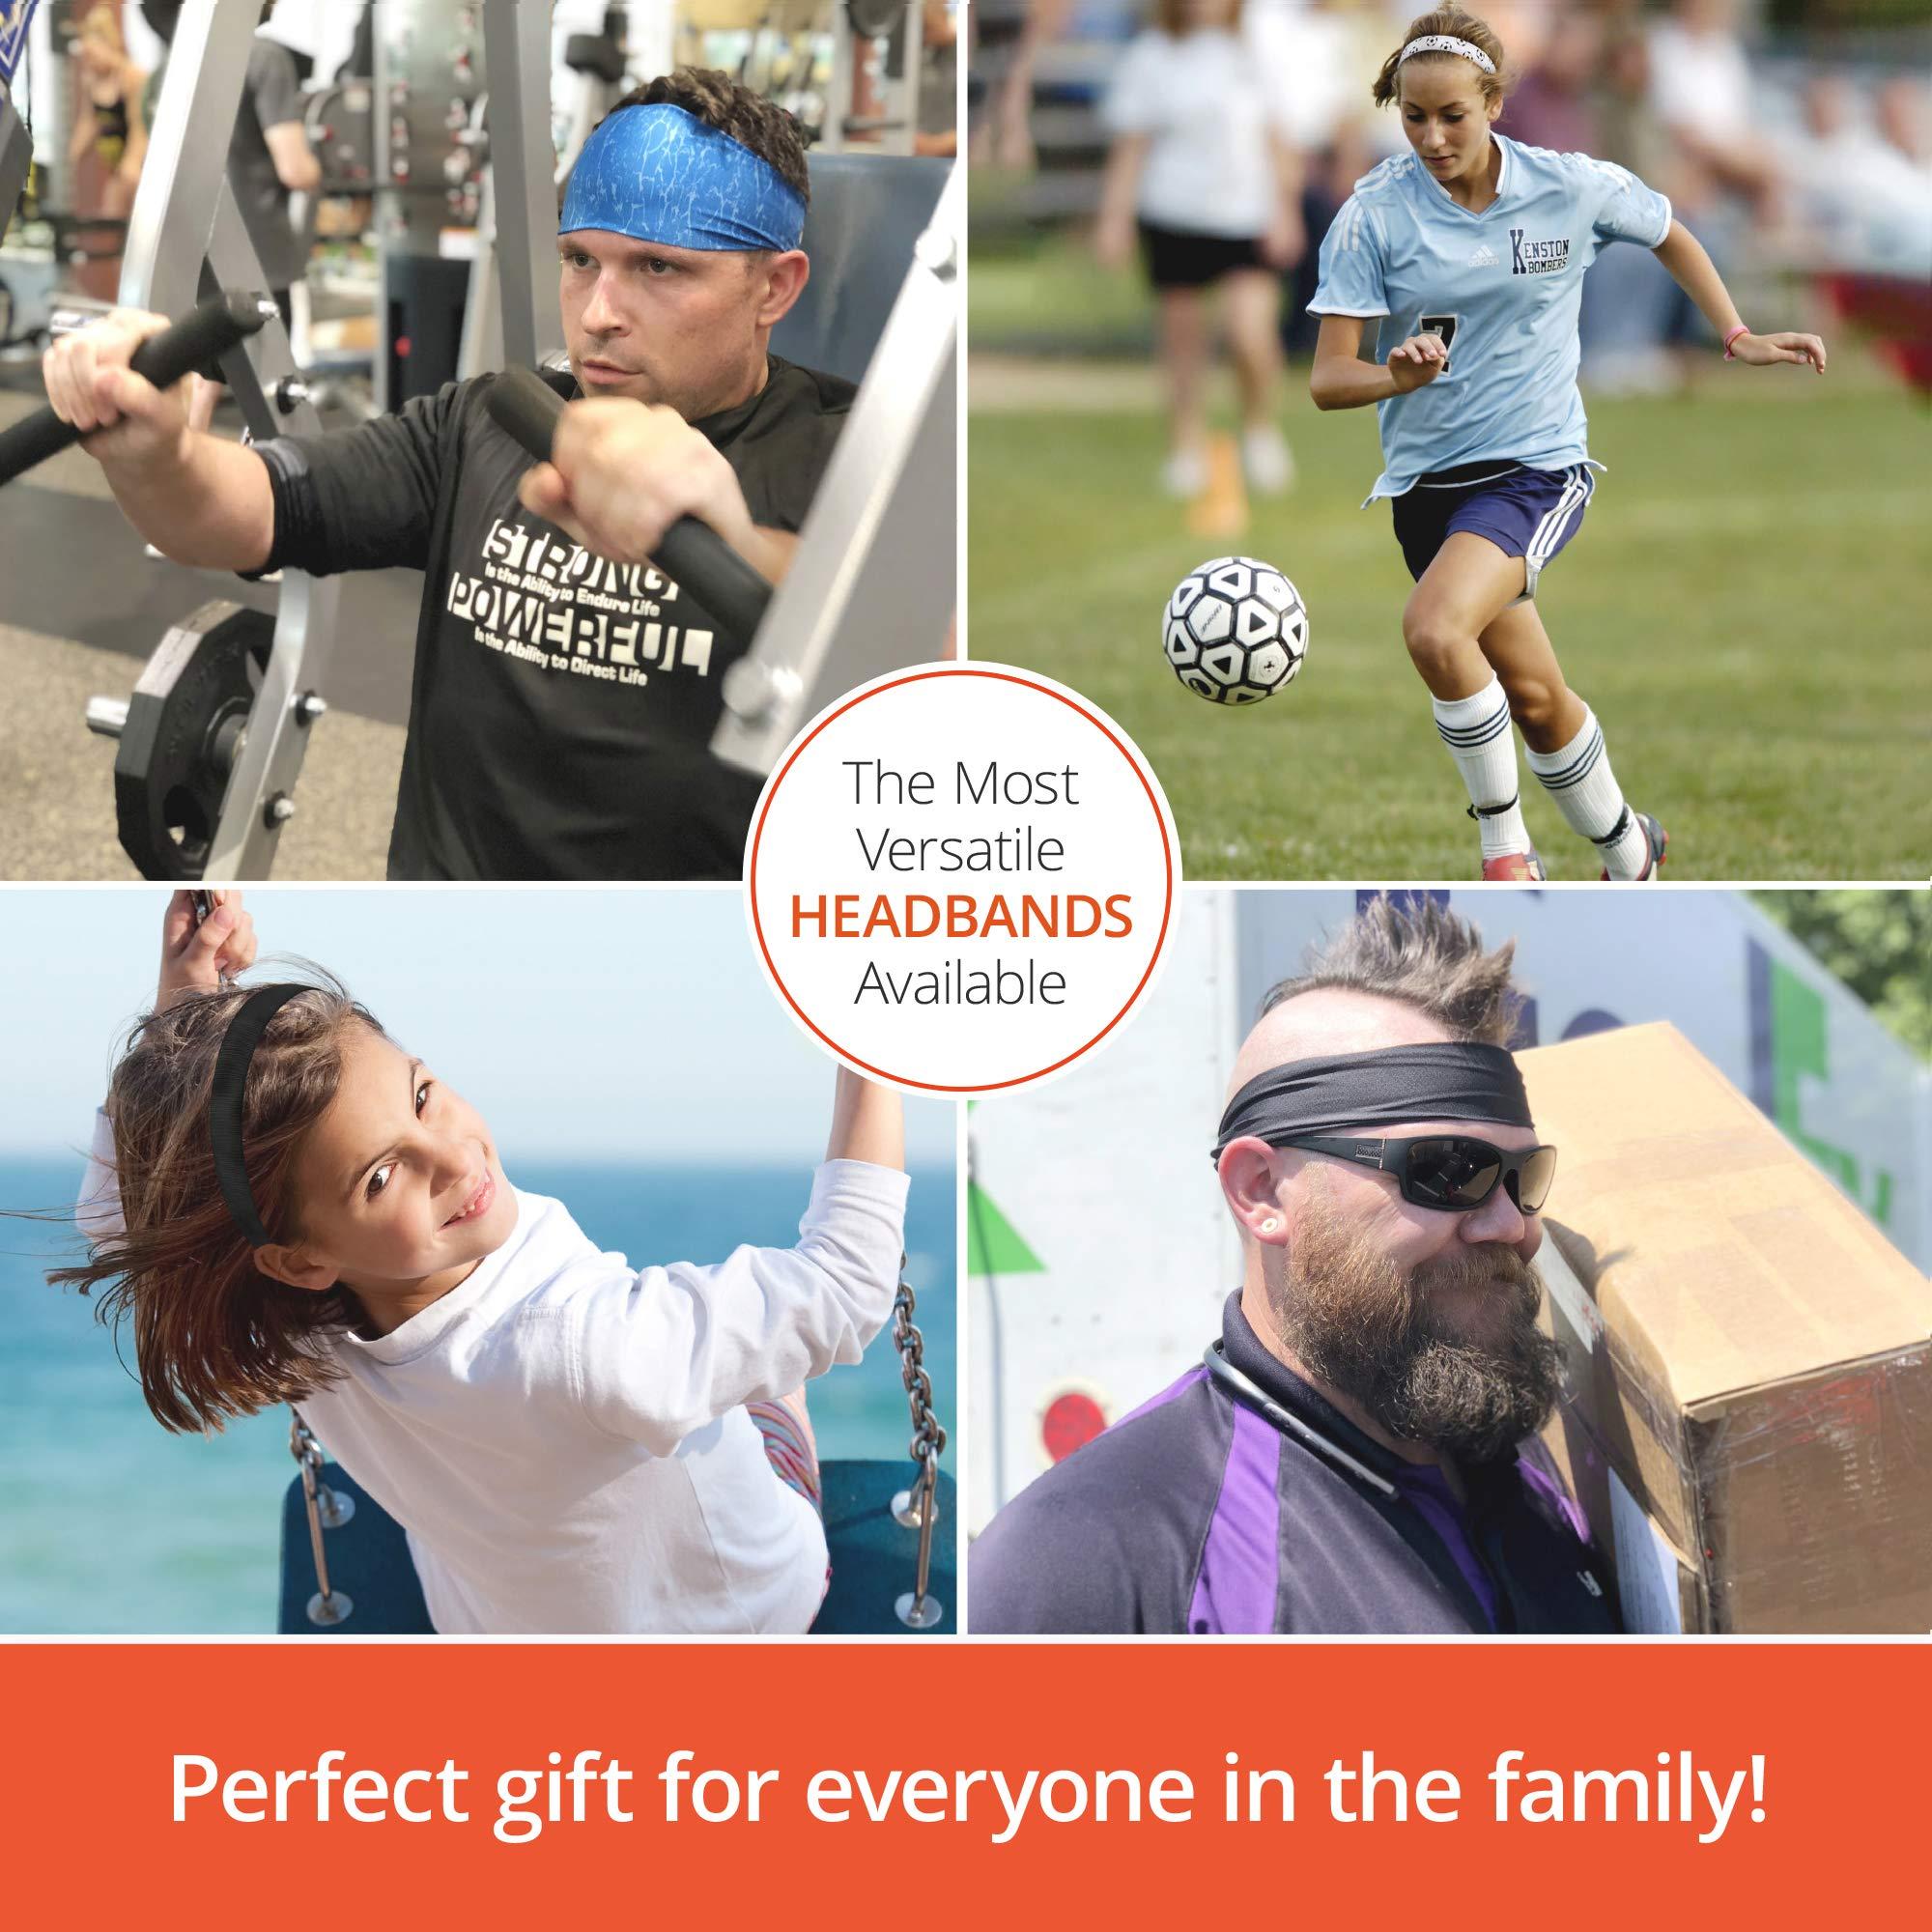 Cooling Headbands Moisture Wicking Womens Sweatband & Sports Headband | Workouts Cardio Running Yoga (Orange Camo) by Bani Bands (Image #7)